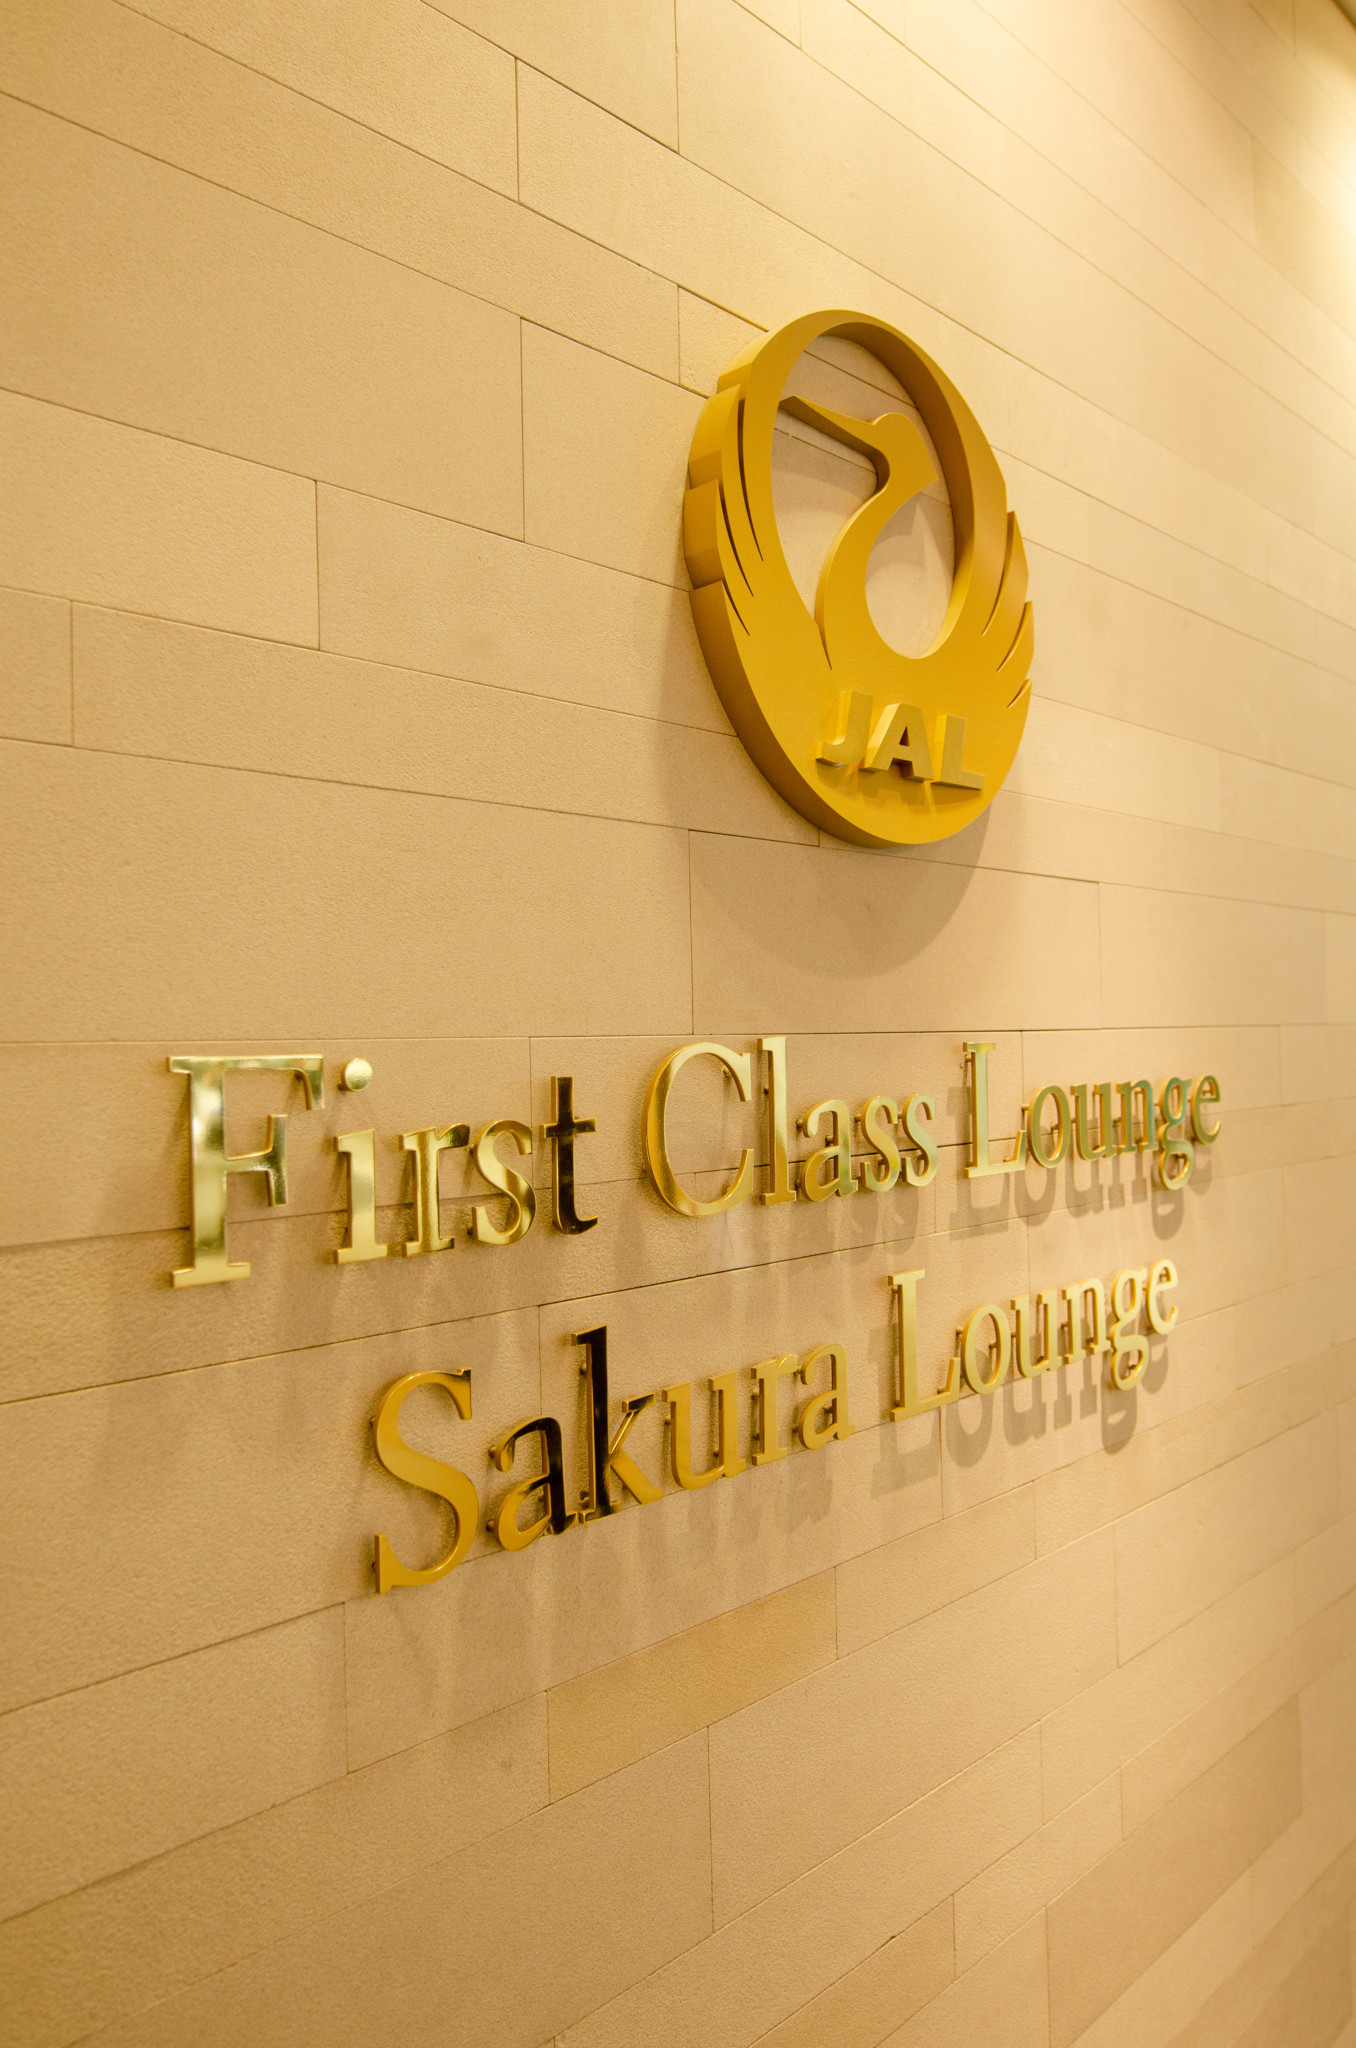 First Class Sakura Lounge Tokio-Narita